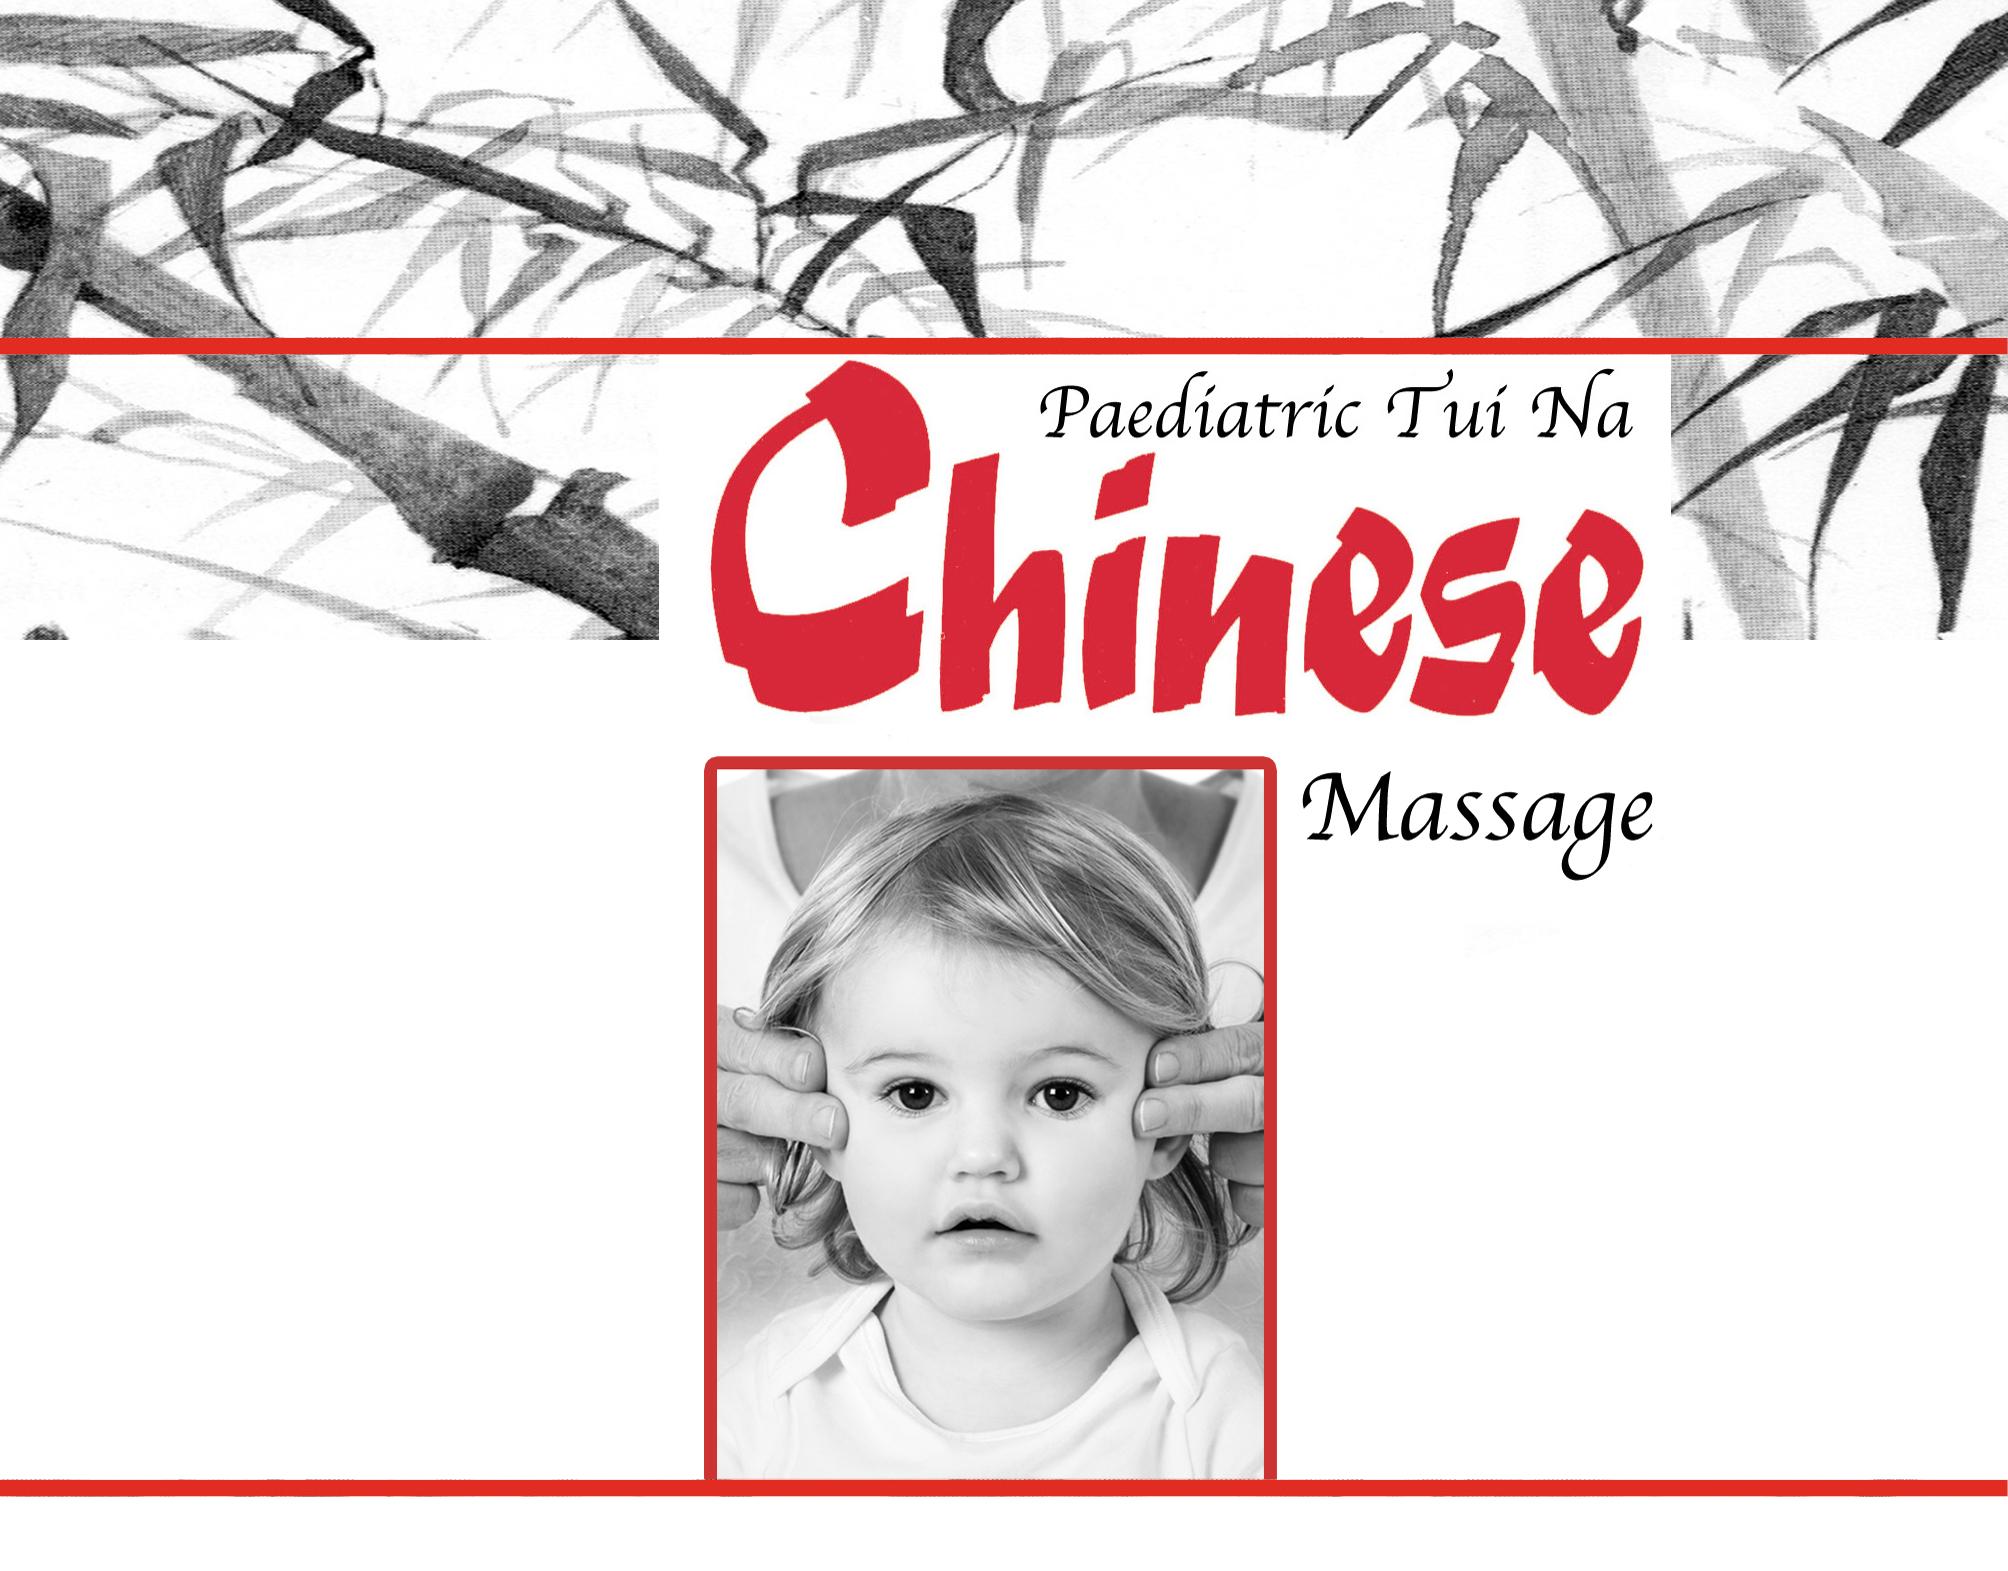 Paediatric Tui Na - Chinese Massage 6 Box set